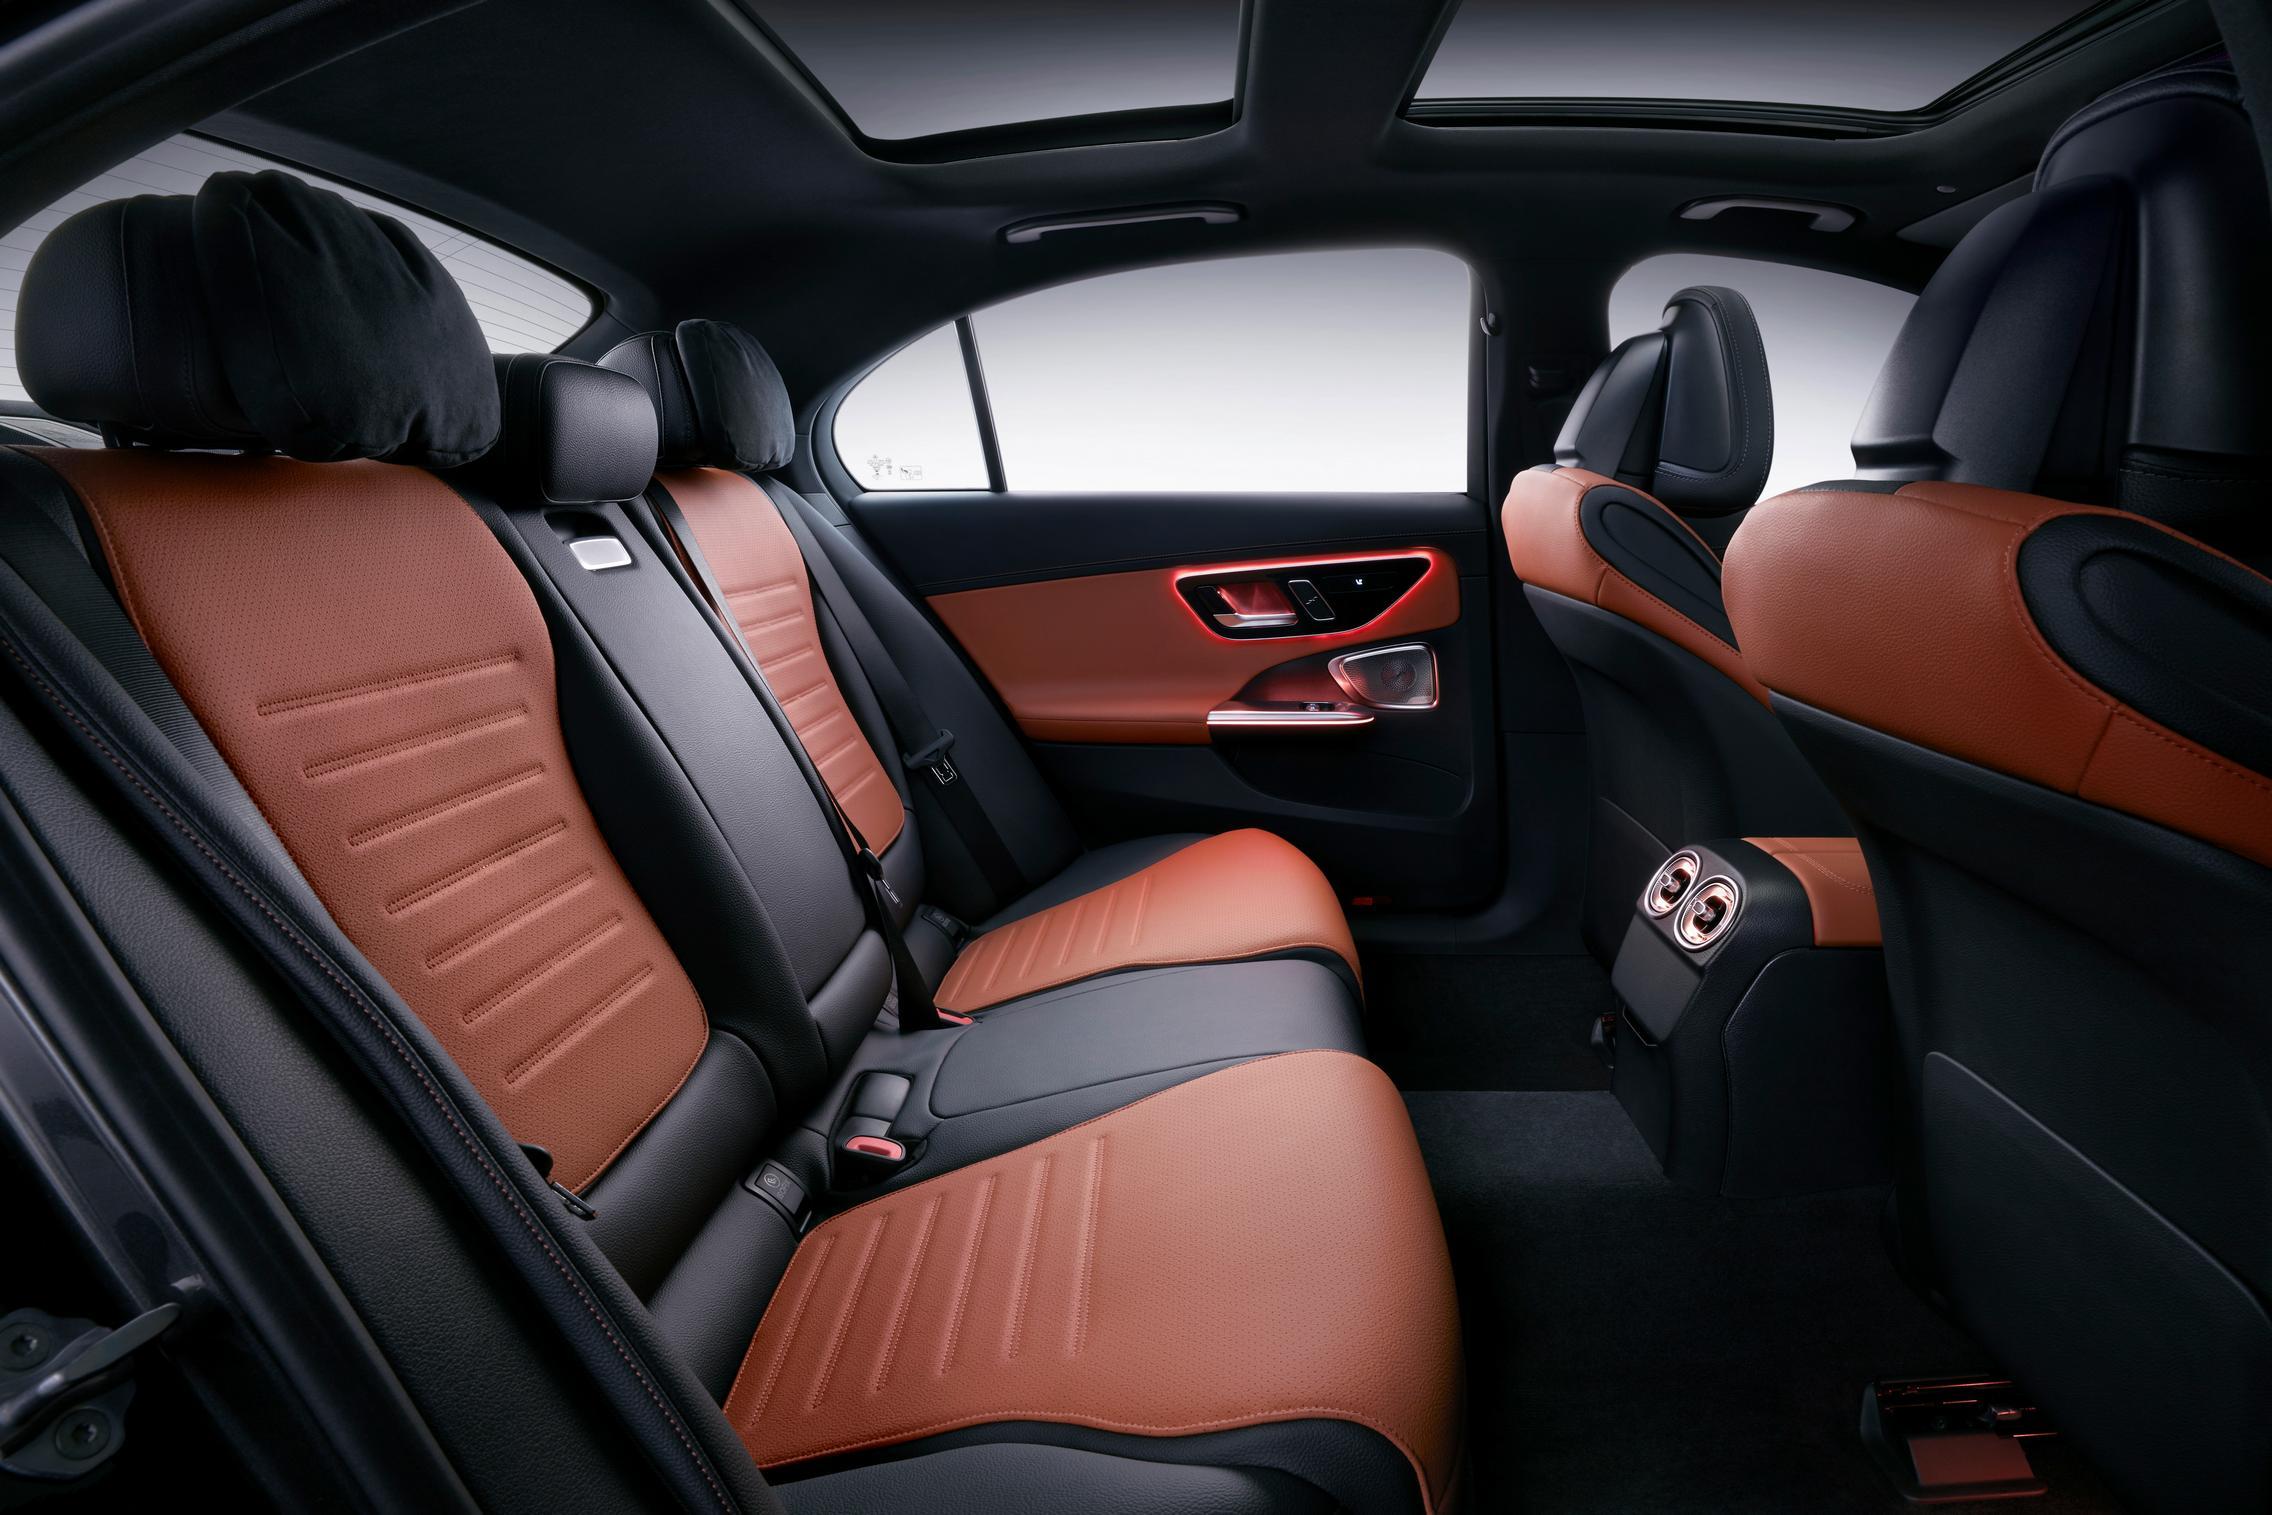 Mercedes C-Class LWB rear seats